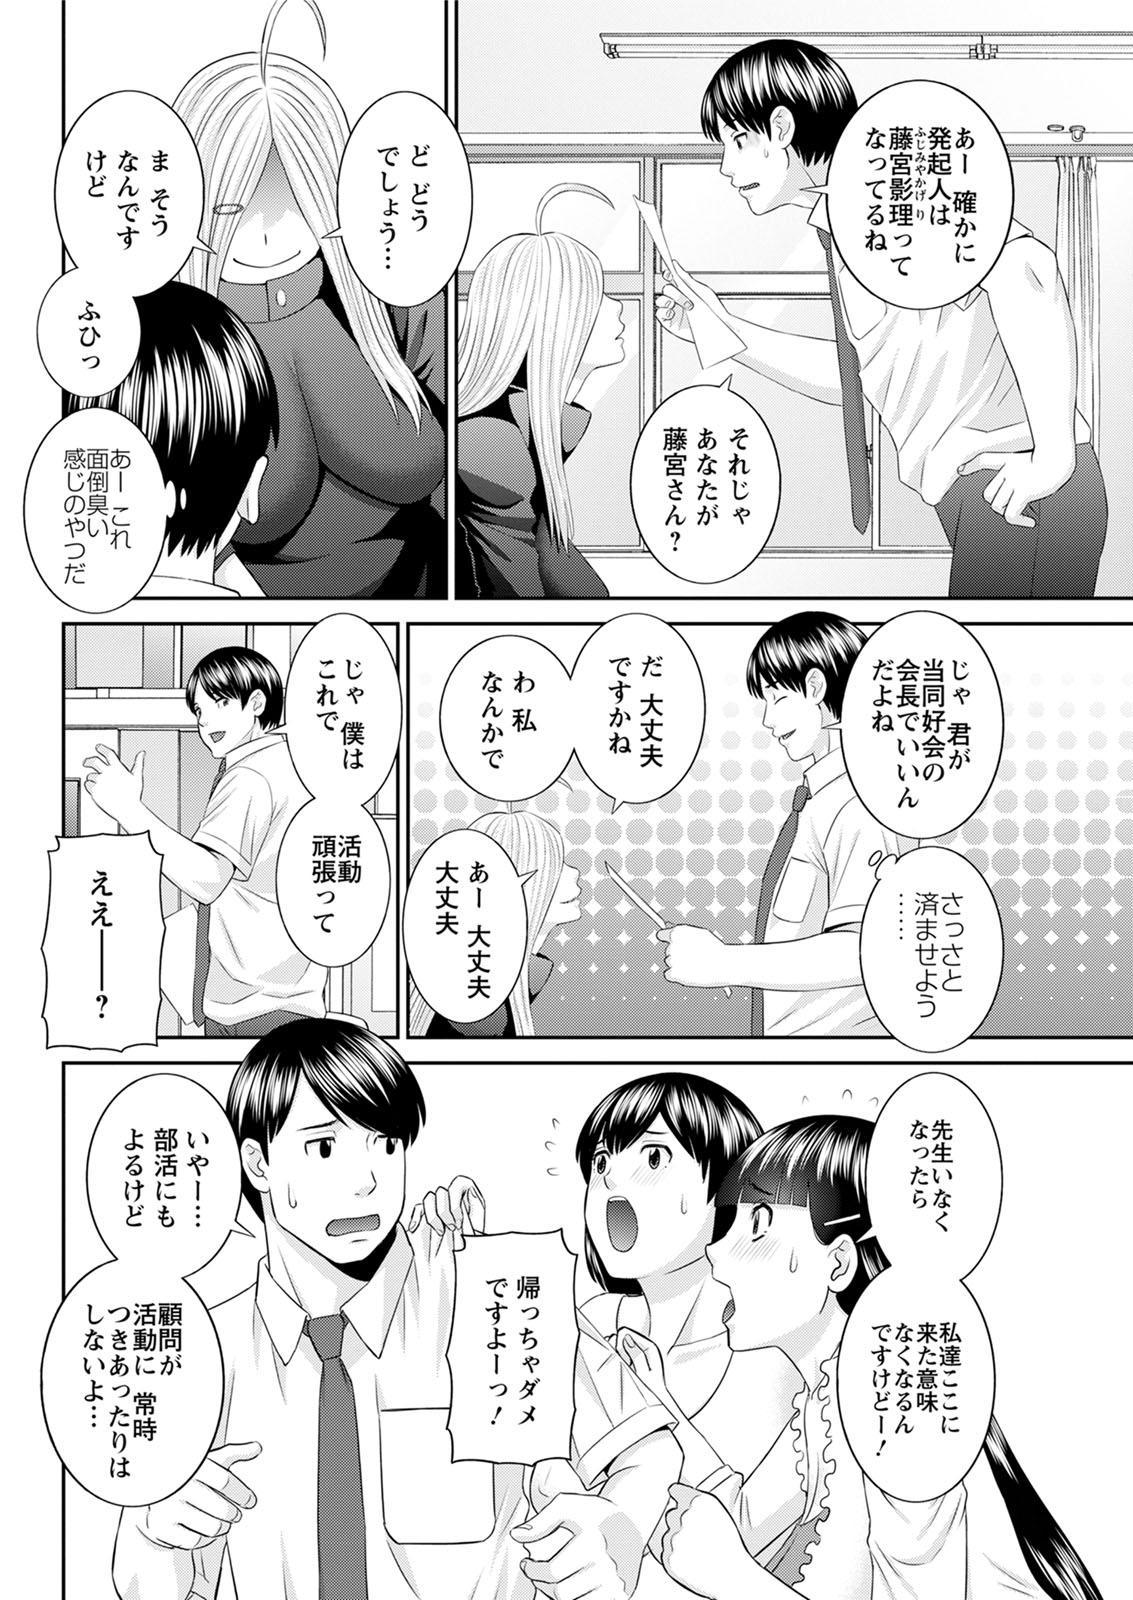 [Kawamori Misaki] Kaikan Hitotsuma Gakuen Ch. 1-6, 8-20 [Digital] 260